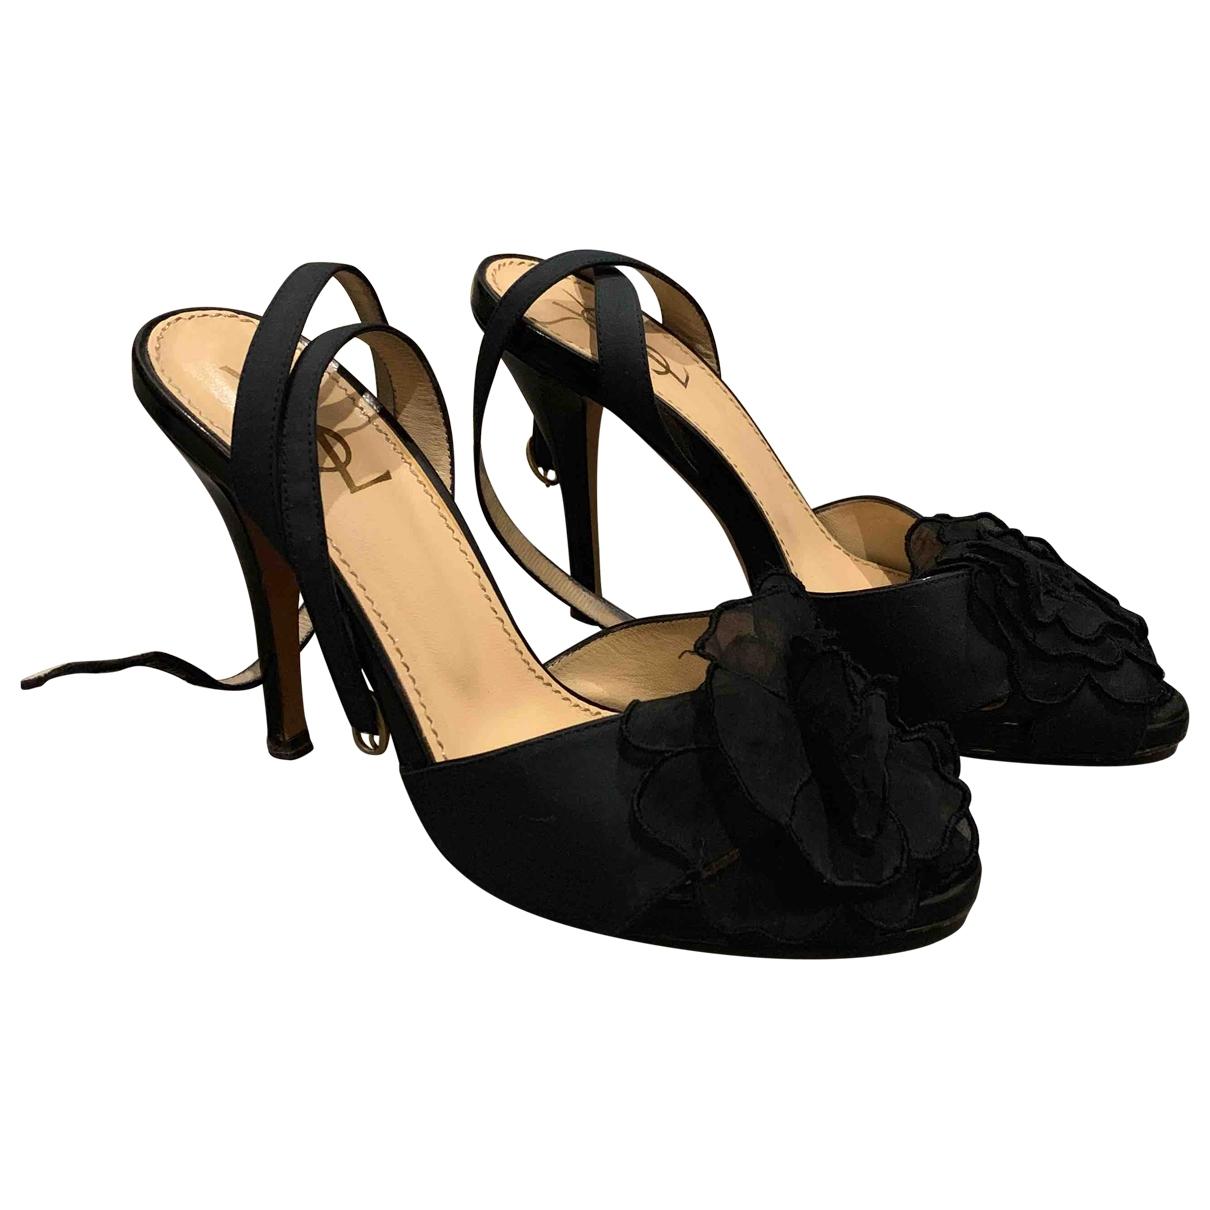 Yves Saint Laurent \N Black Leather Sandals for Women 38 EU